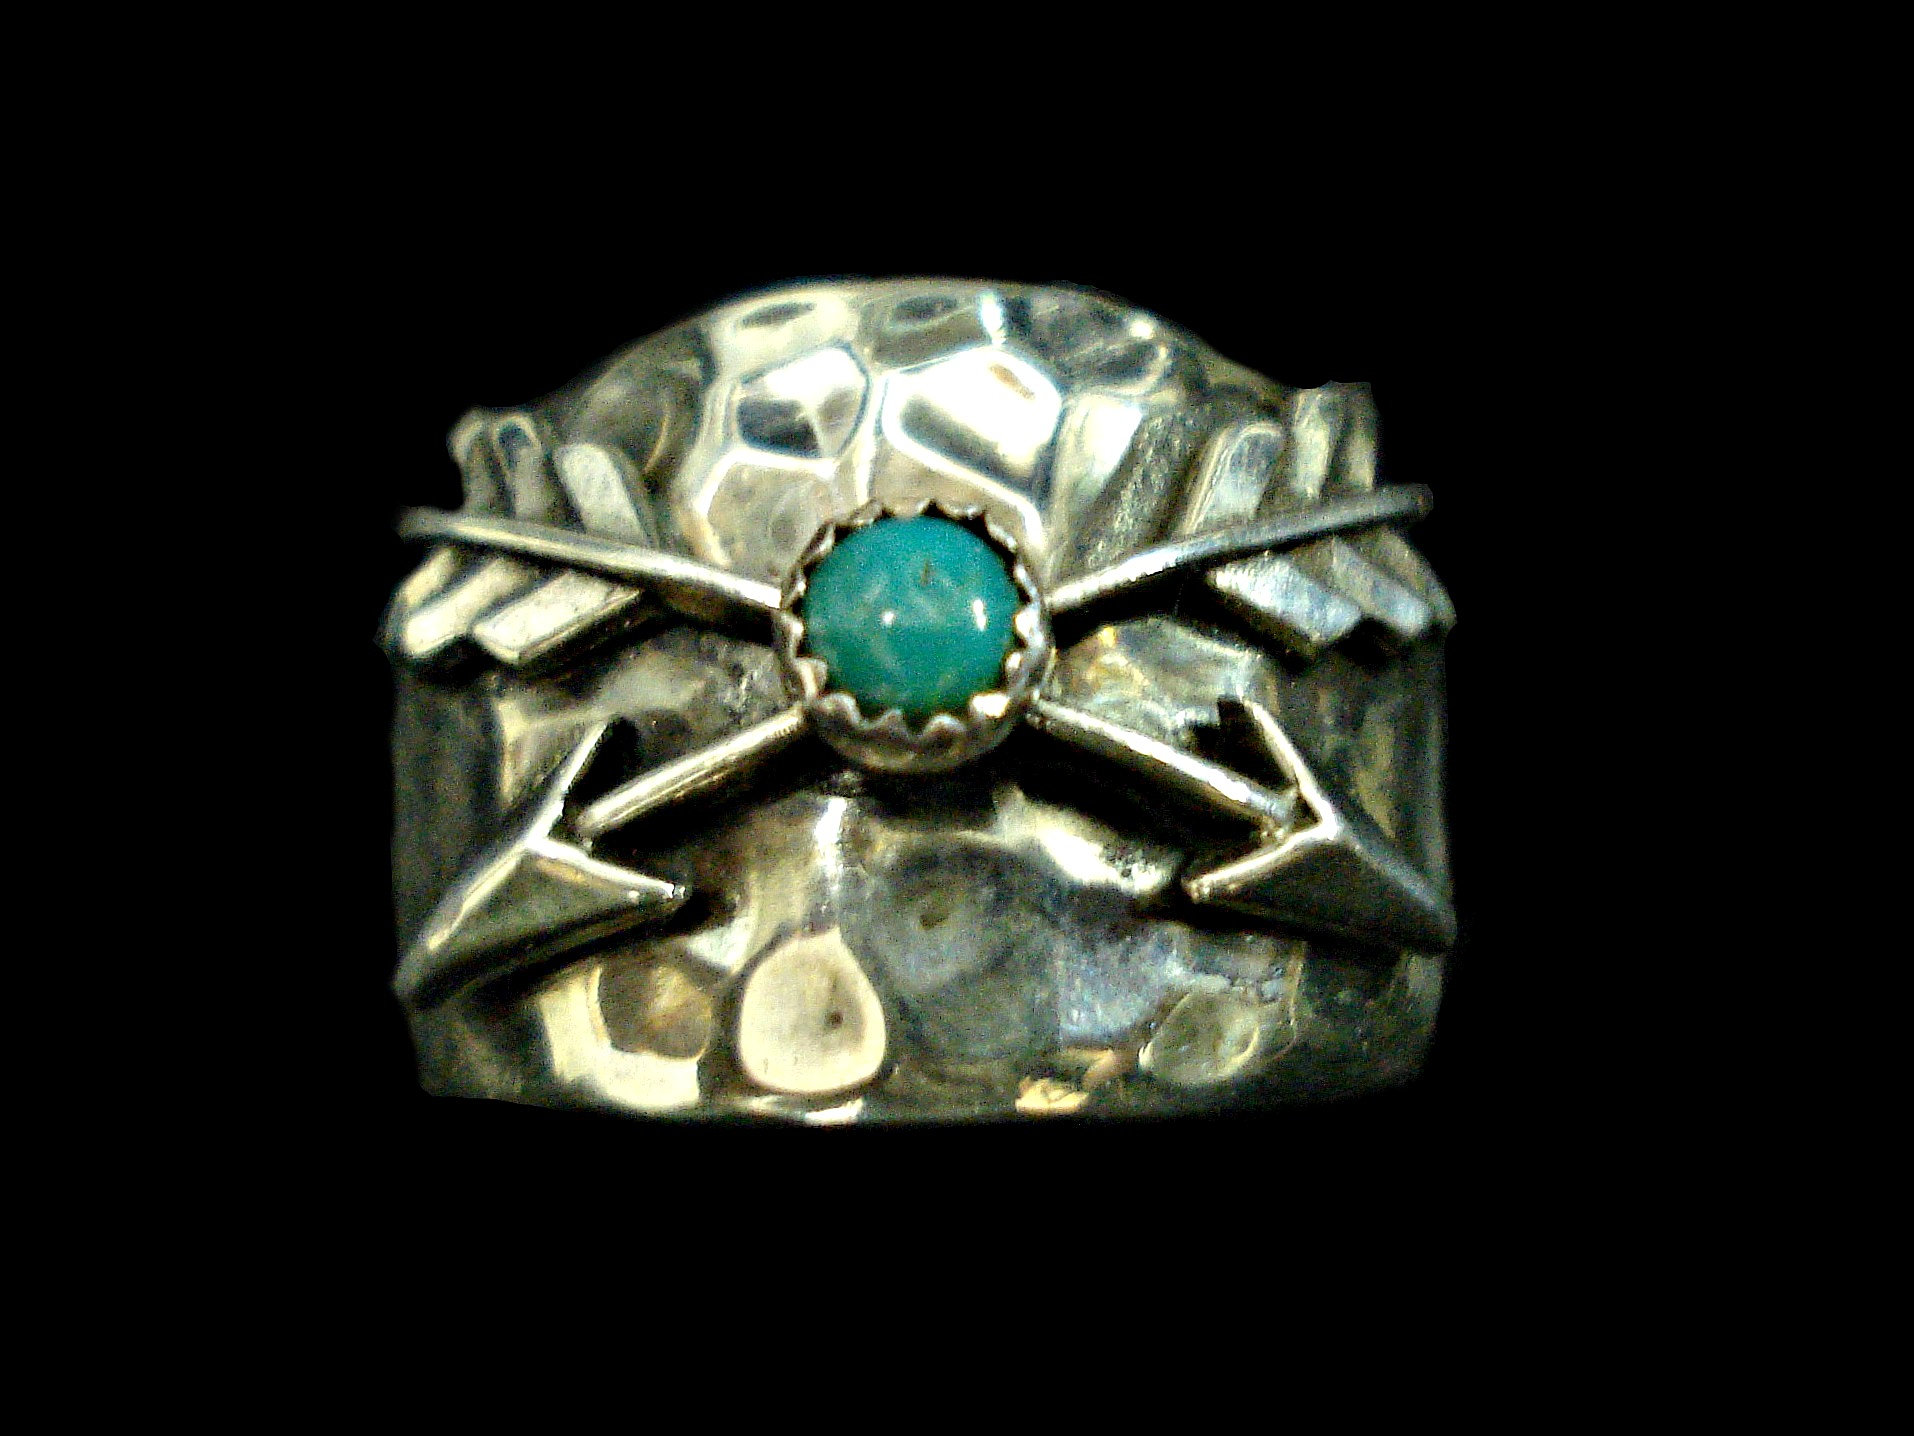 Richard schmidt jewelry design crossed arrows ring for Jewelry storm arrow ring